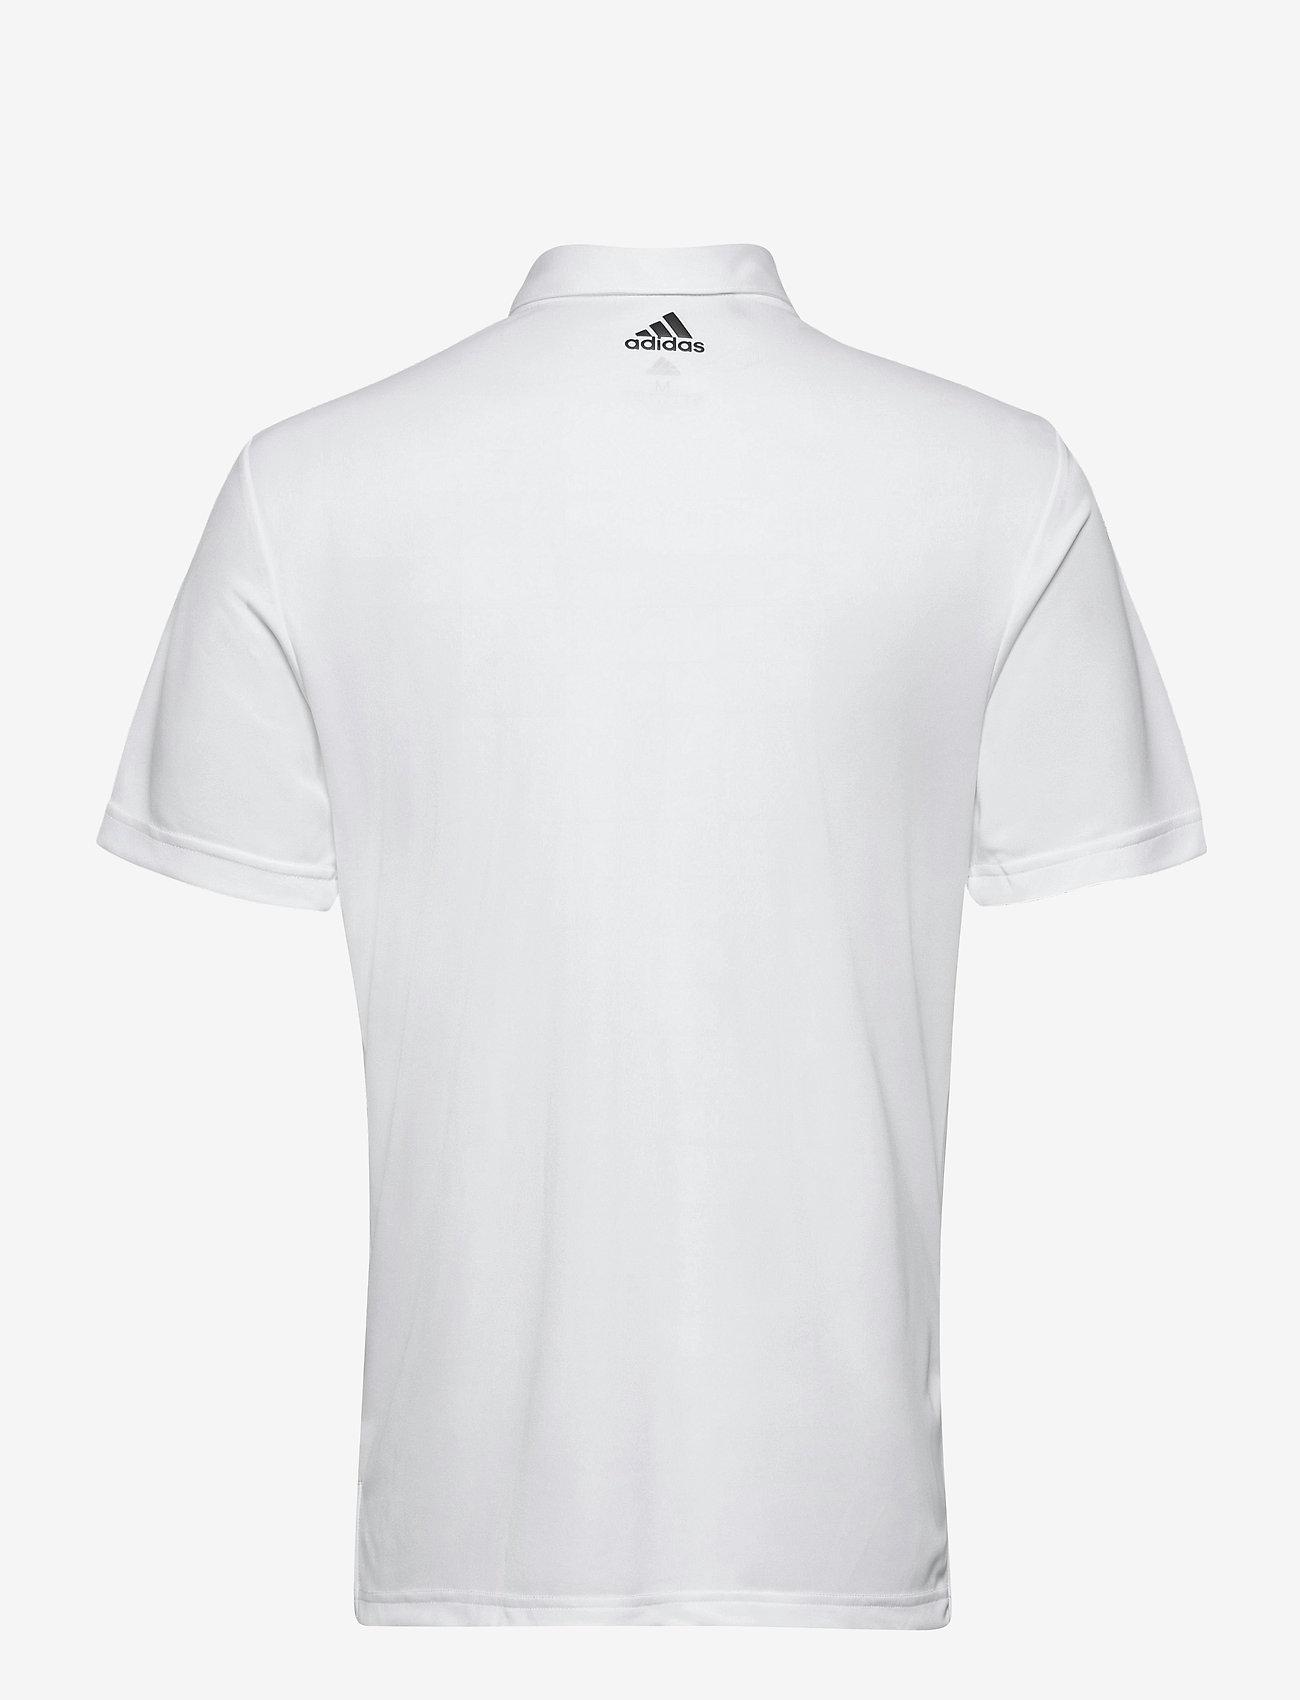 adidas Golf - 3-Stripe Basic - kurzärmelig - white/black - 1